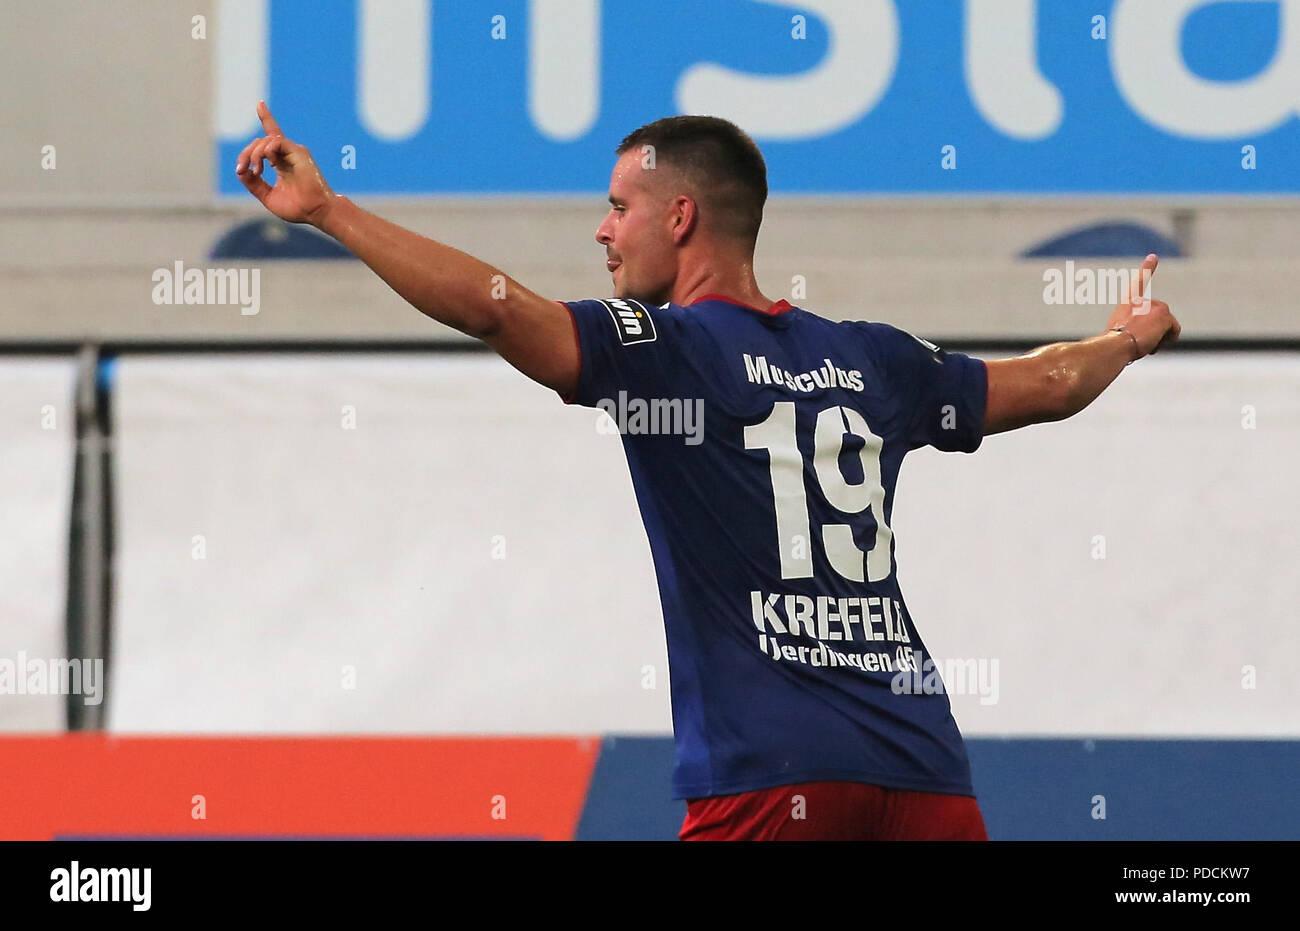 Duisburg, Germany. 08th Aug, 2018. Duisburg, Germany August 8 2018, 3rd league matchday 3, KFC Uerdingen 05 vs SV Meppen: Jubilation 3-2 Lucas Musculus (KFC) Credit: Juergen Schwarz/Alamy Live News - Stock Image